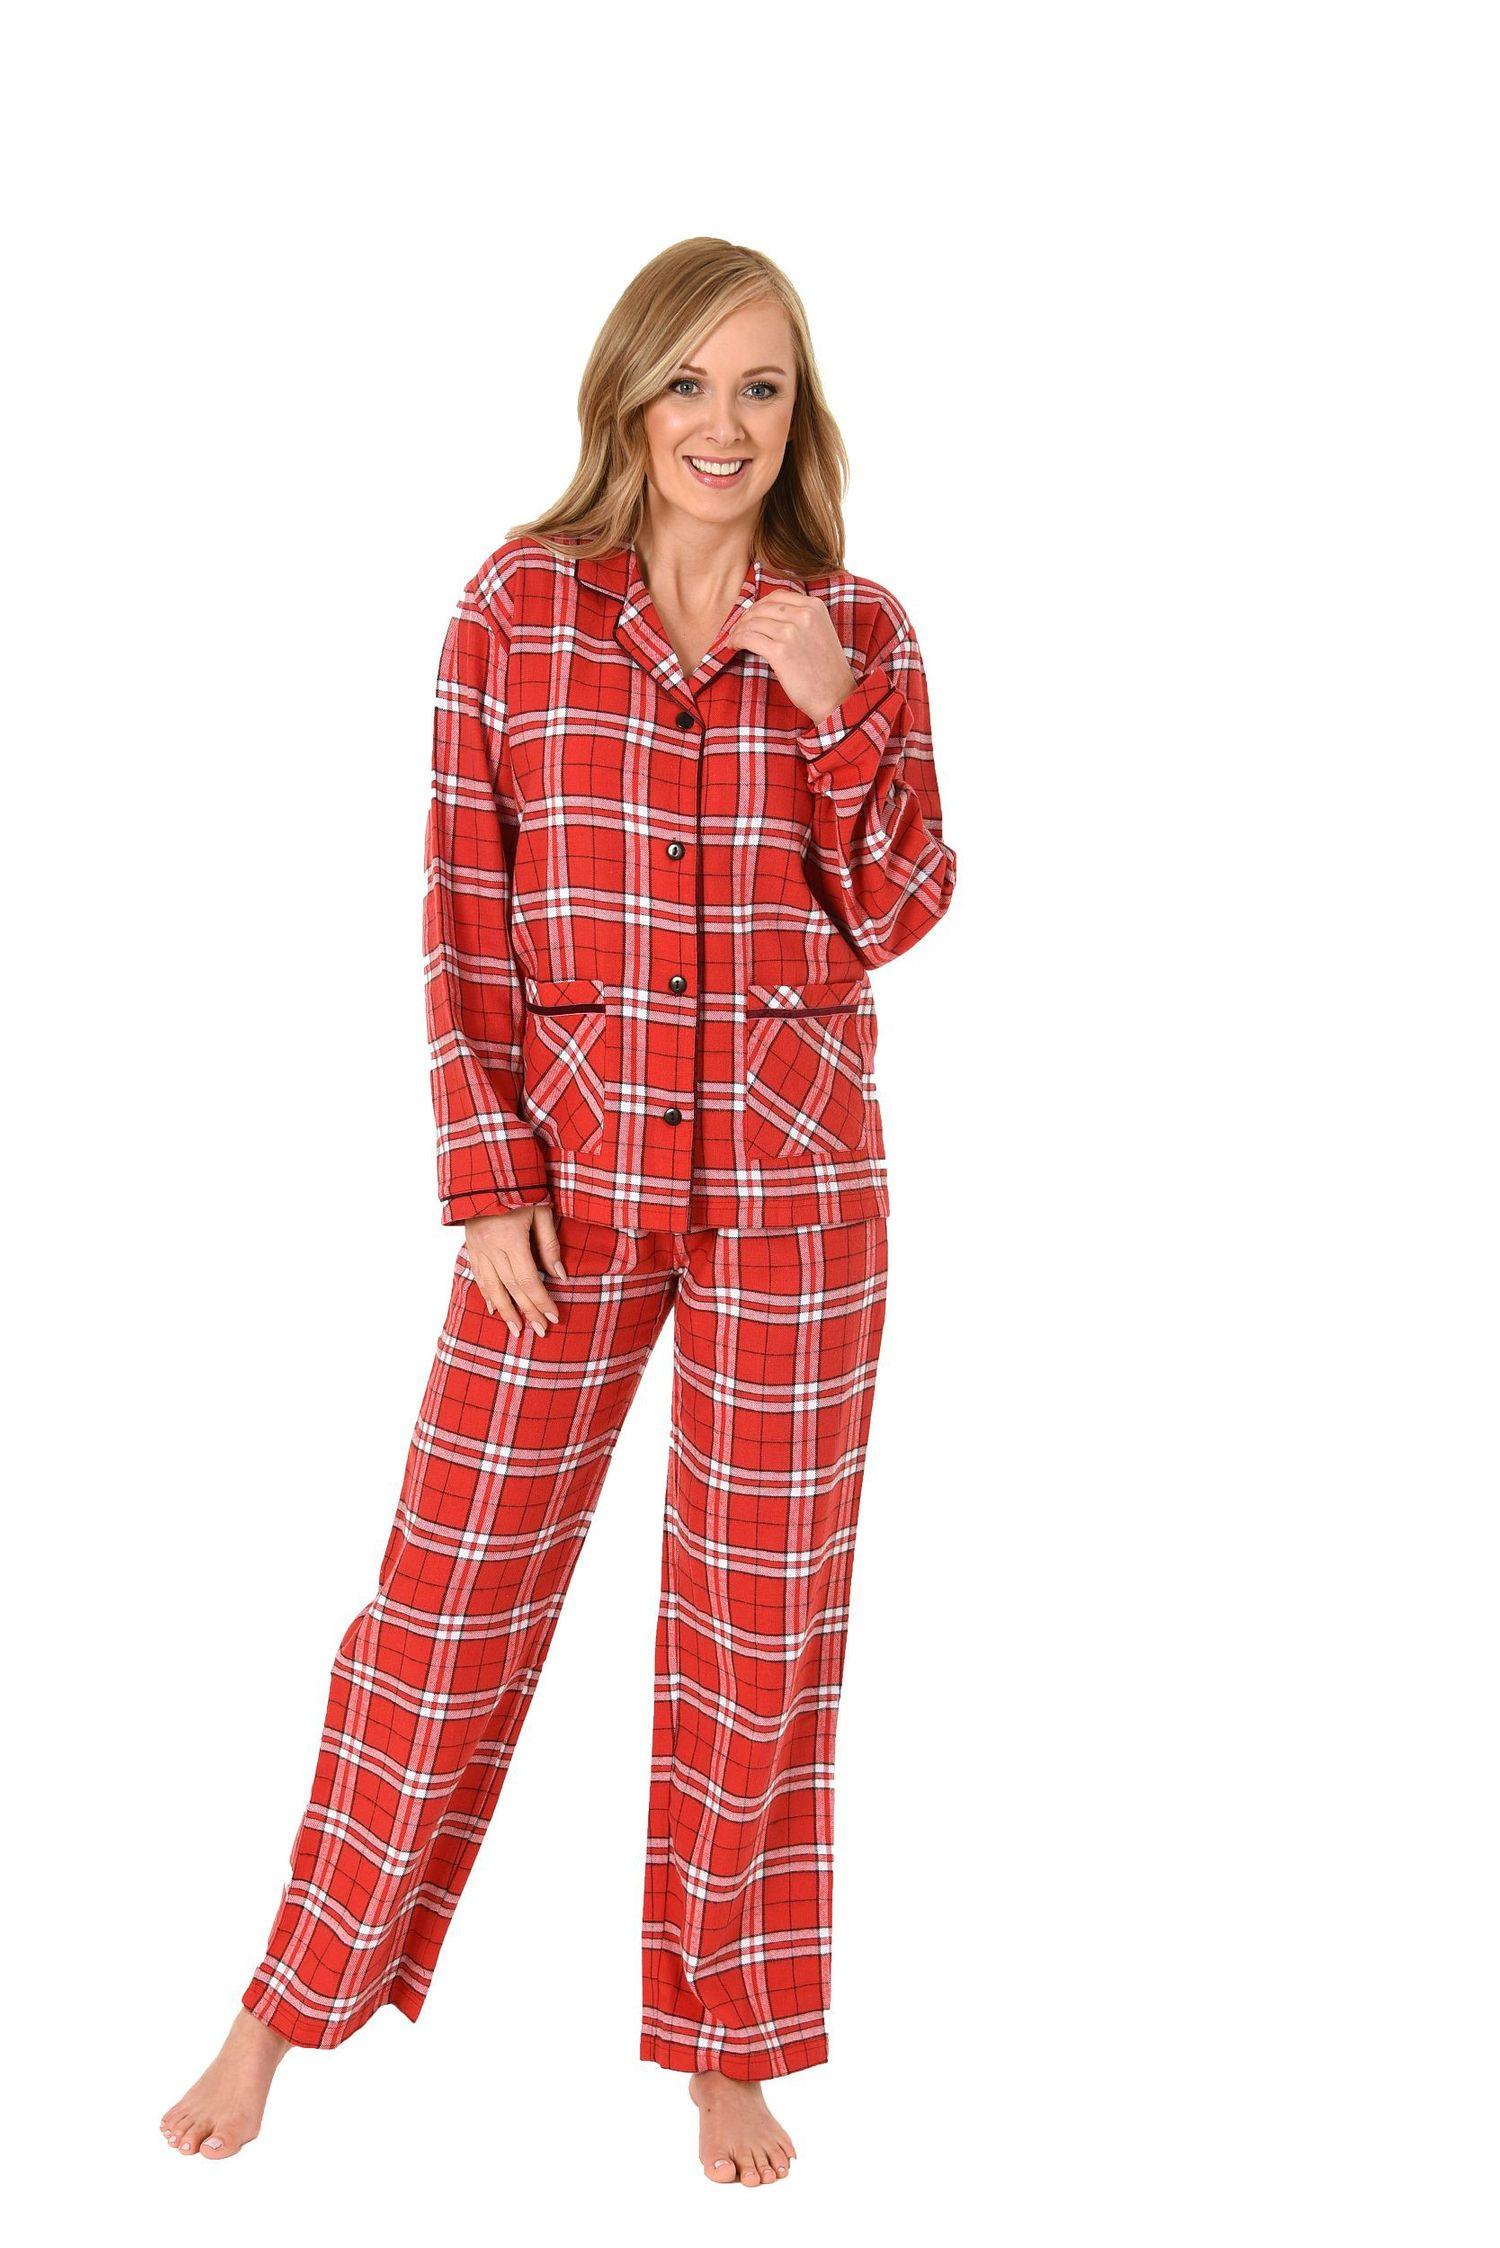 Damen Flanell Pyjama langarm Karodesign – 271 201 95 001